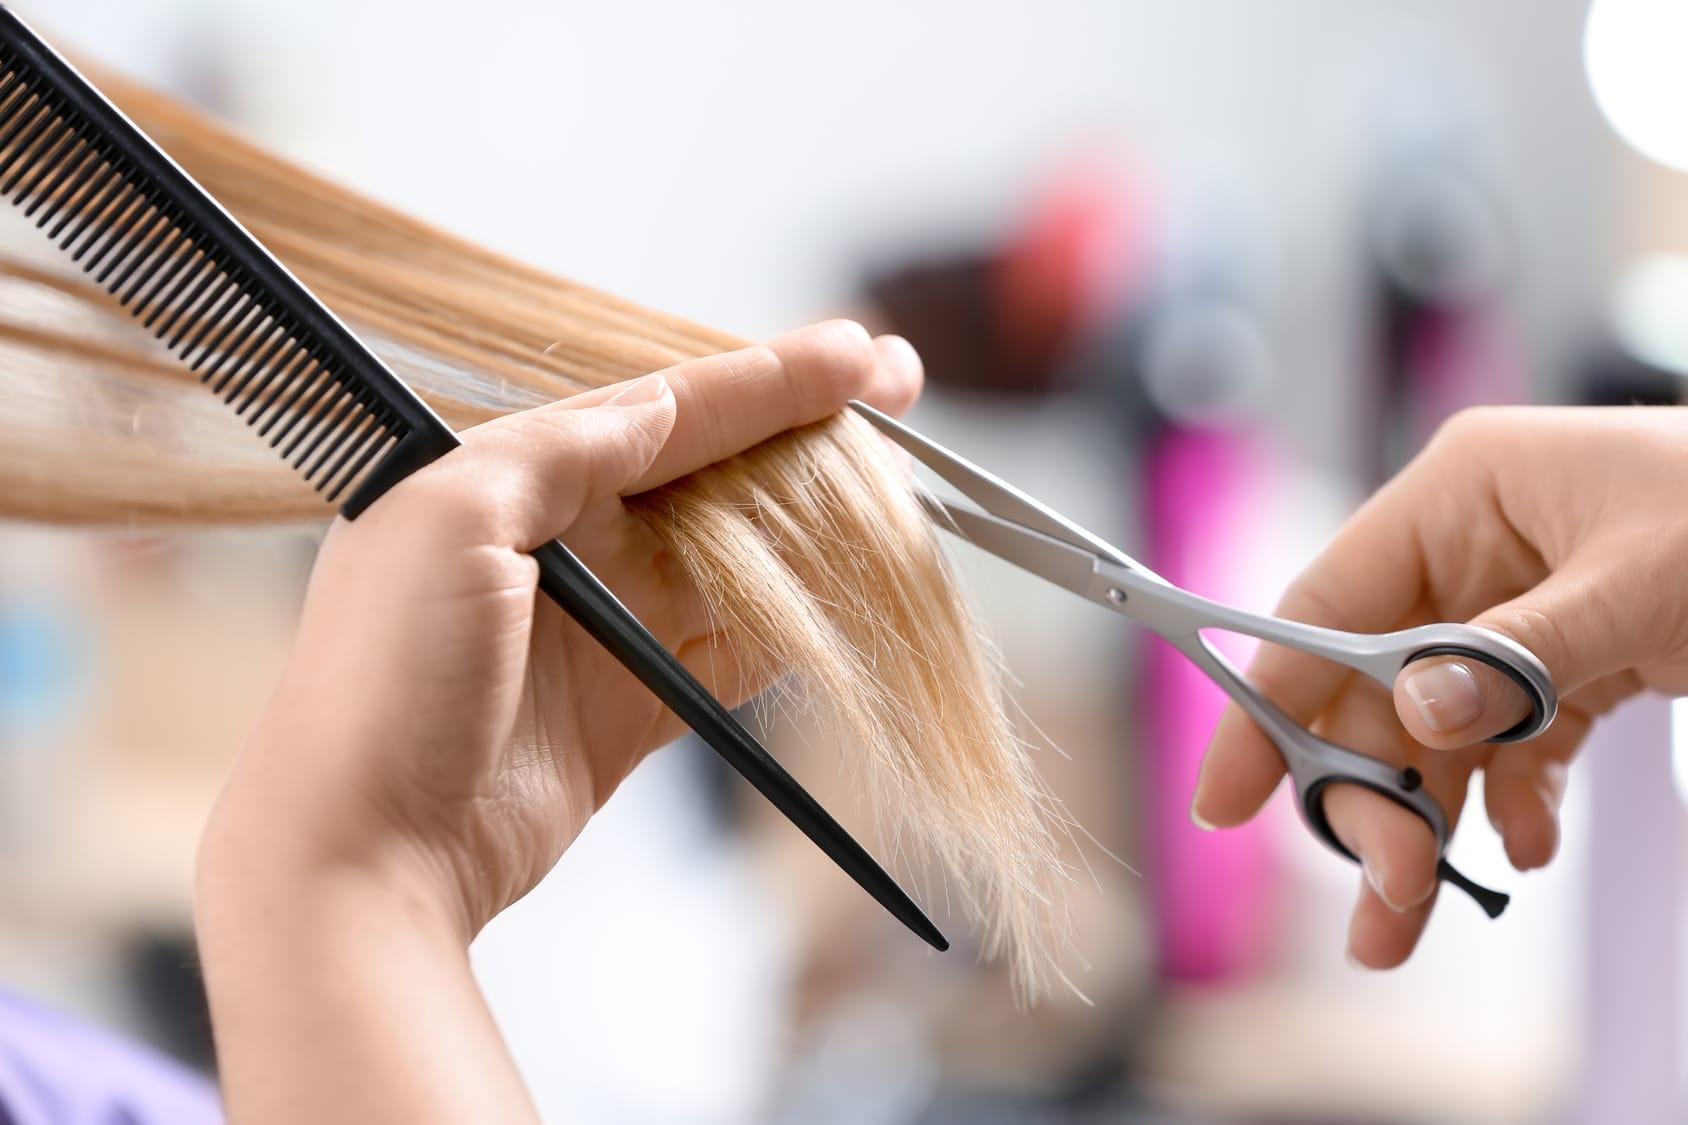 Haare Selber Schneiden 6 Tipps Tricks Haushaltstipps Net